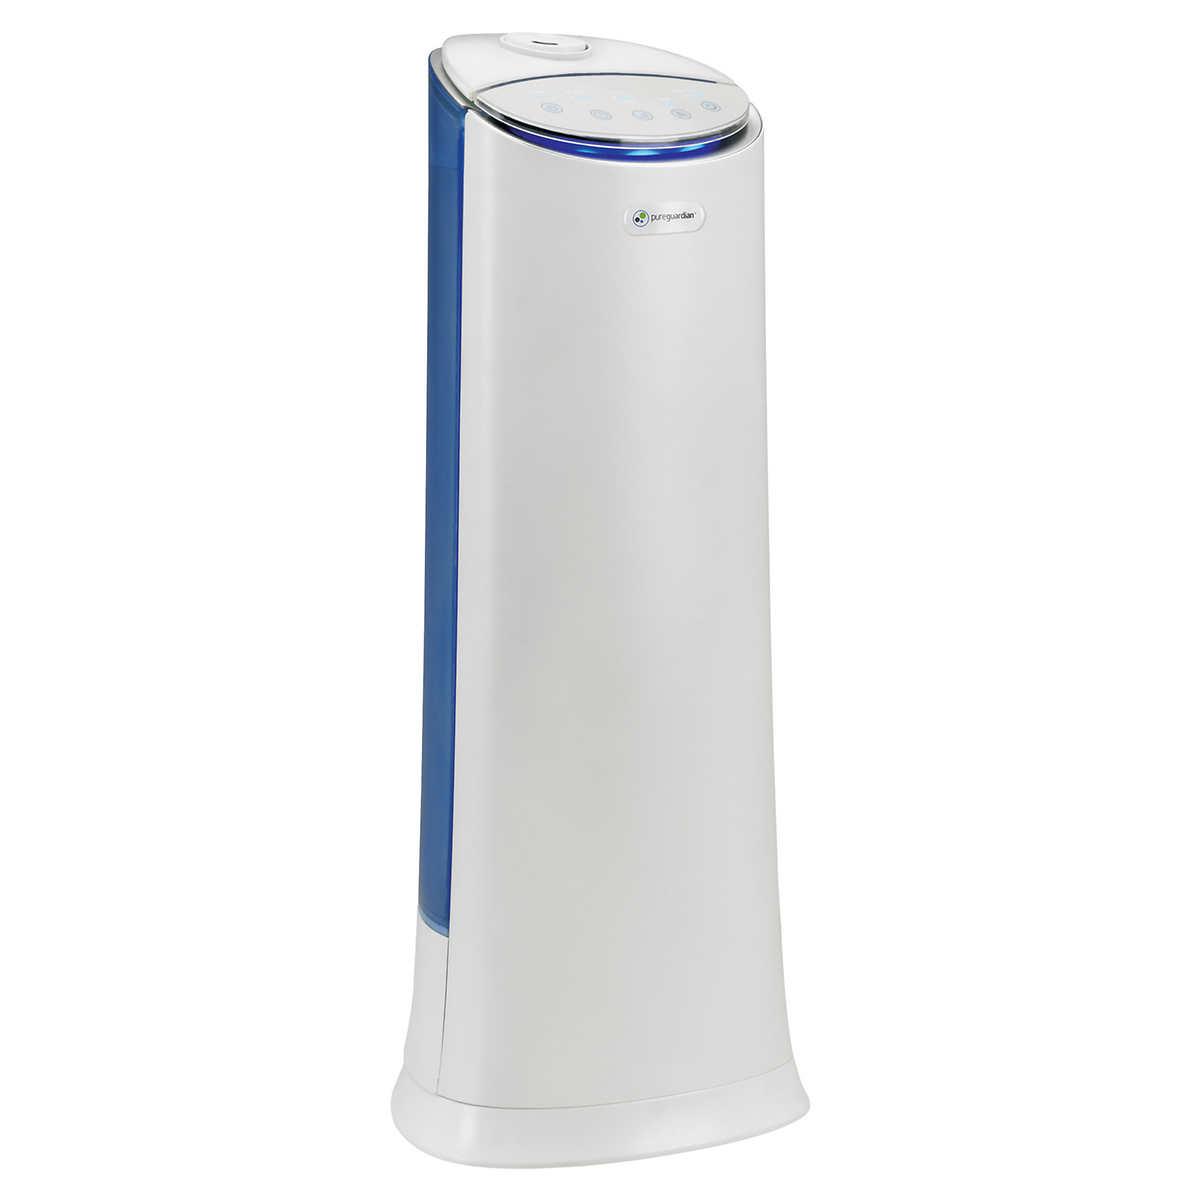 Pureguardian 100 Hour Ultrasonic Warm Cool Mist Humidifier Aroma Tray